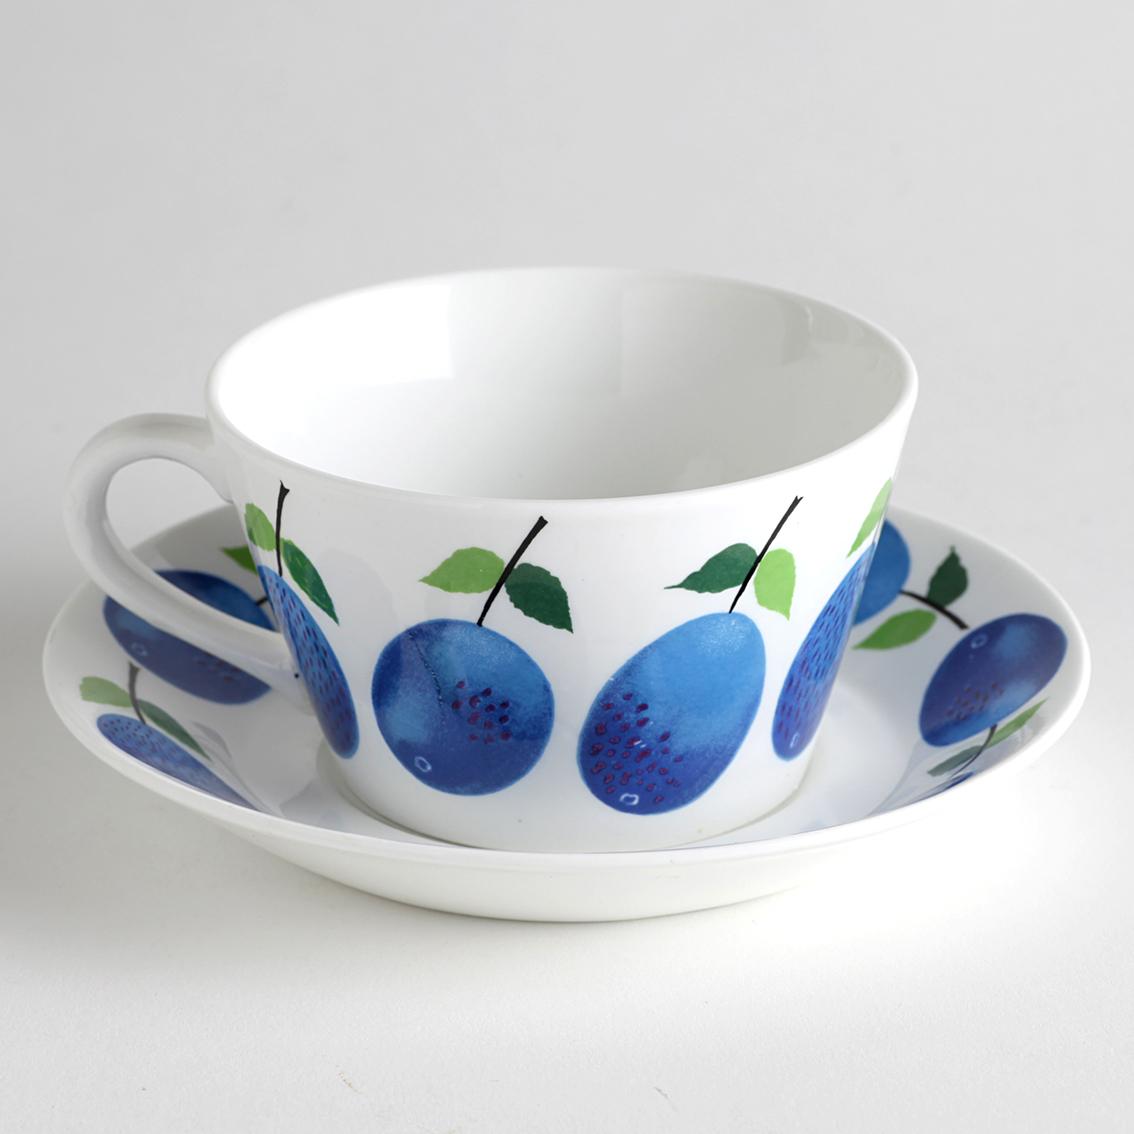 Gustavsberg グスタフスベリ Prunus プルーヌス ティーカップ&ソーサー-2 北欧ヴィンテージ